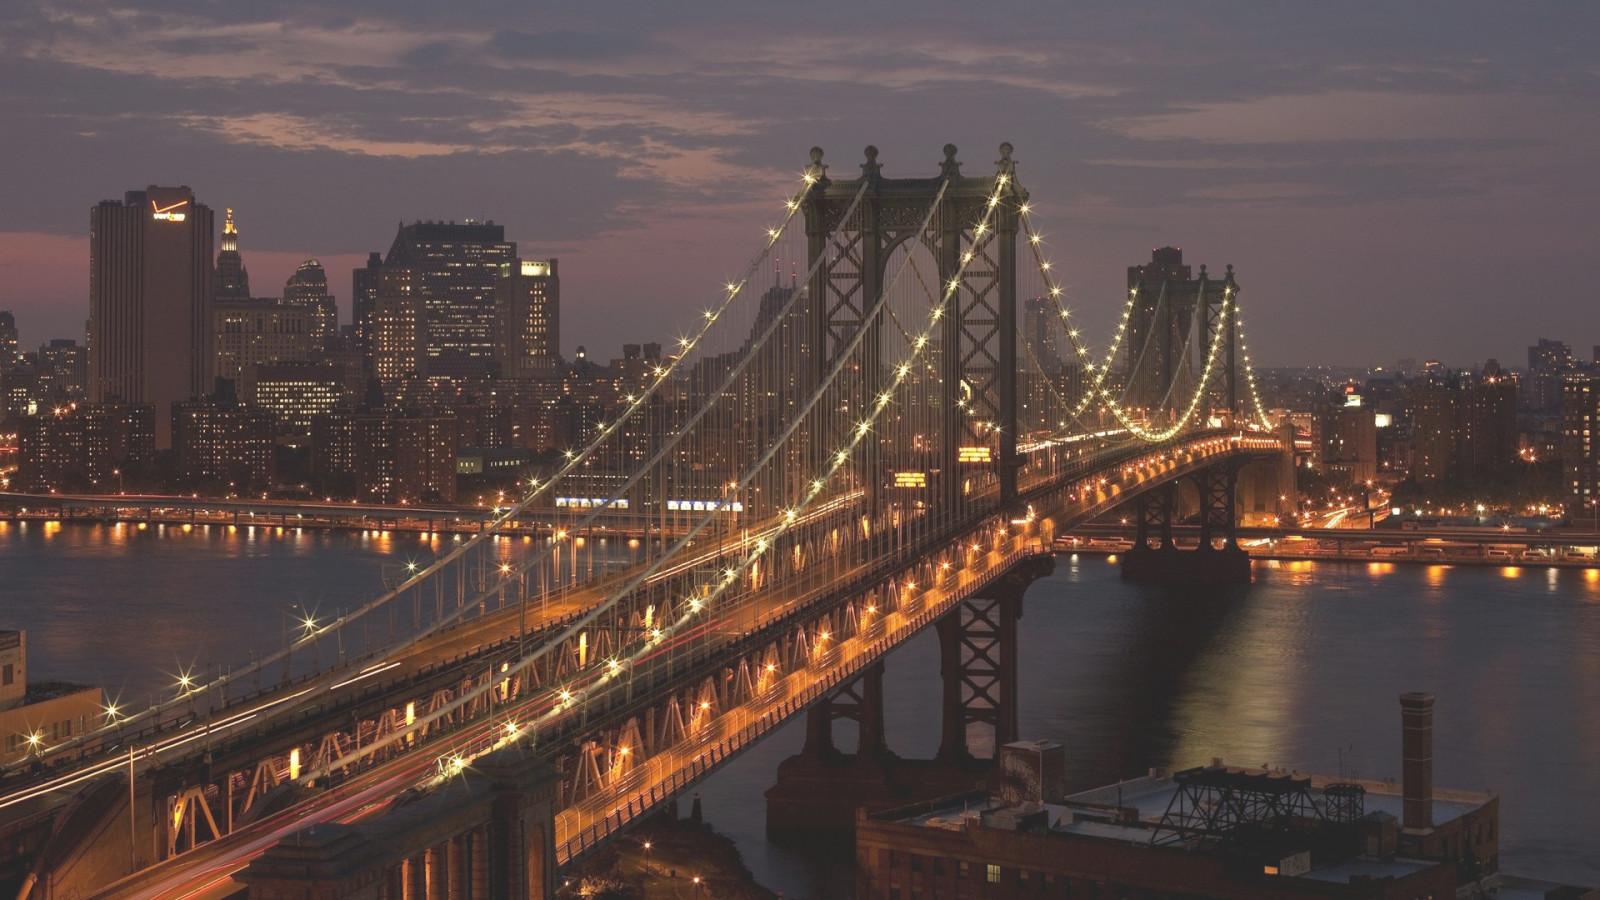 Dcouvrir Bushwick, le quartier du street art New York Photos gratuites new york